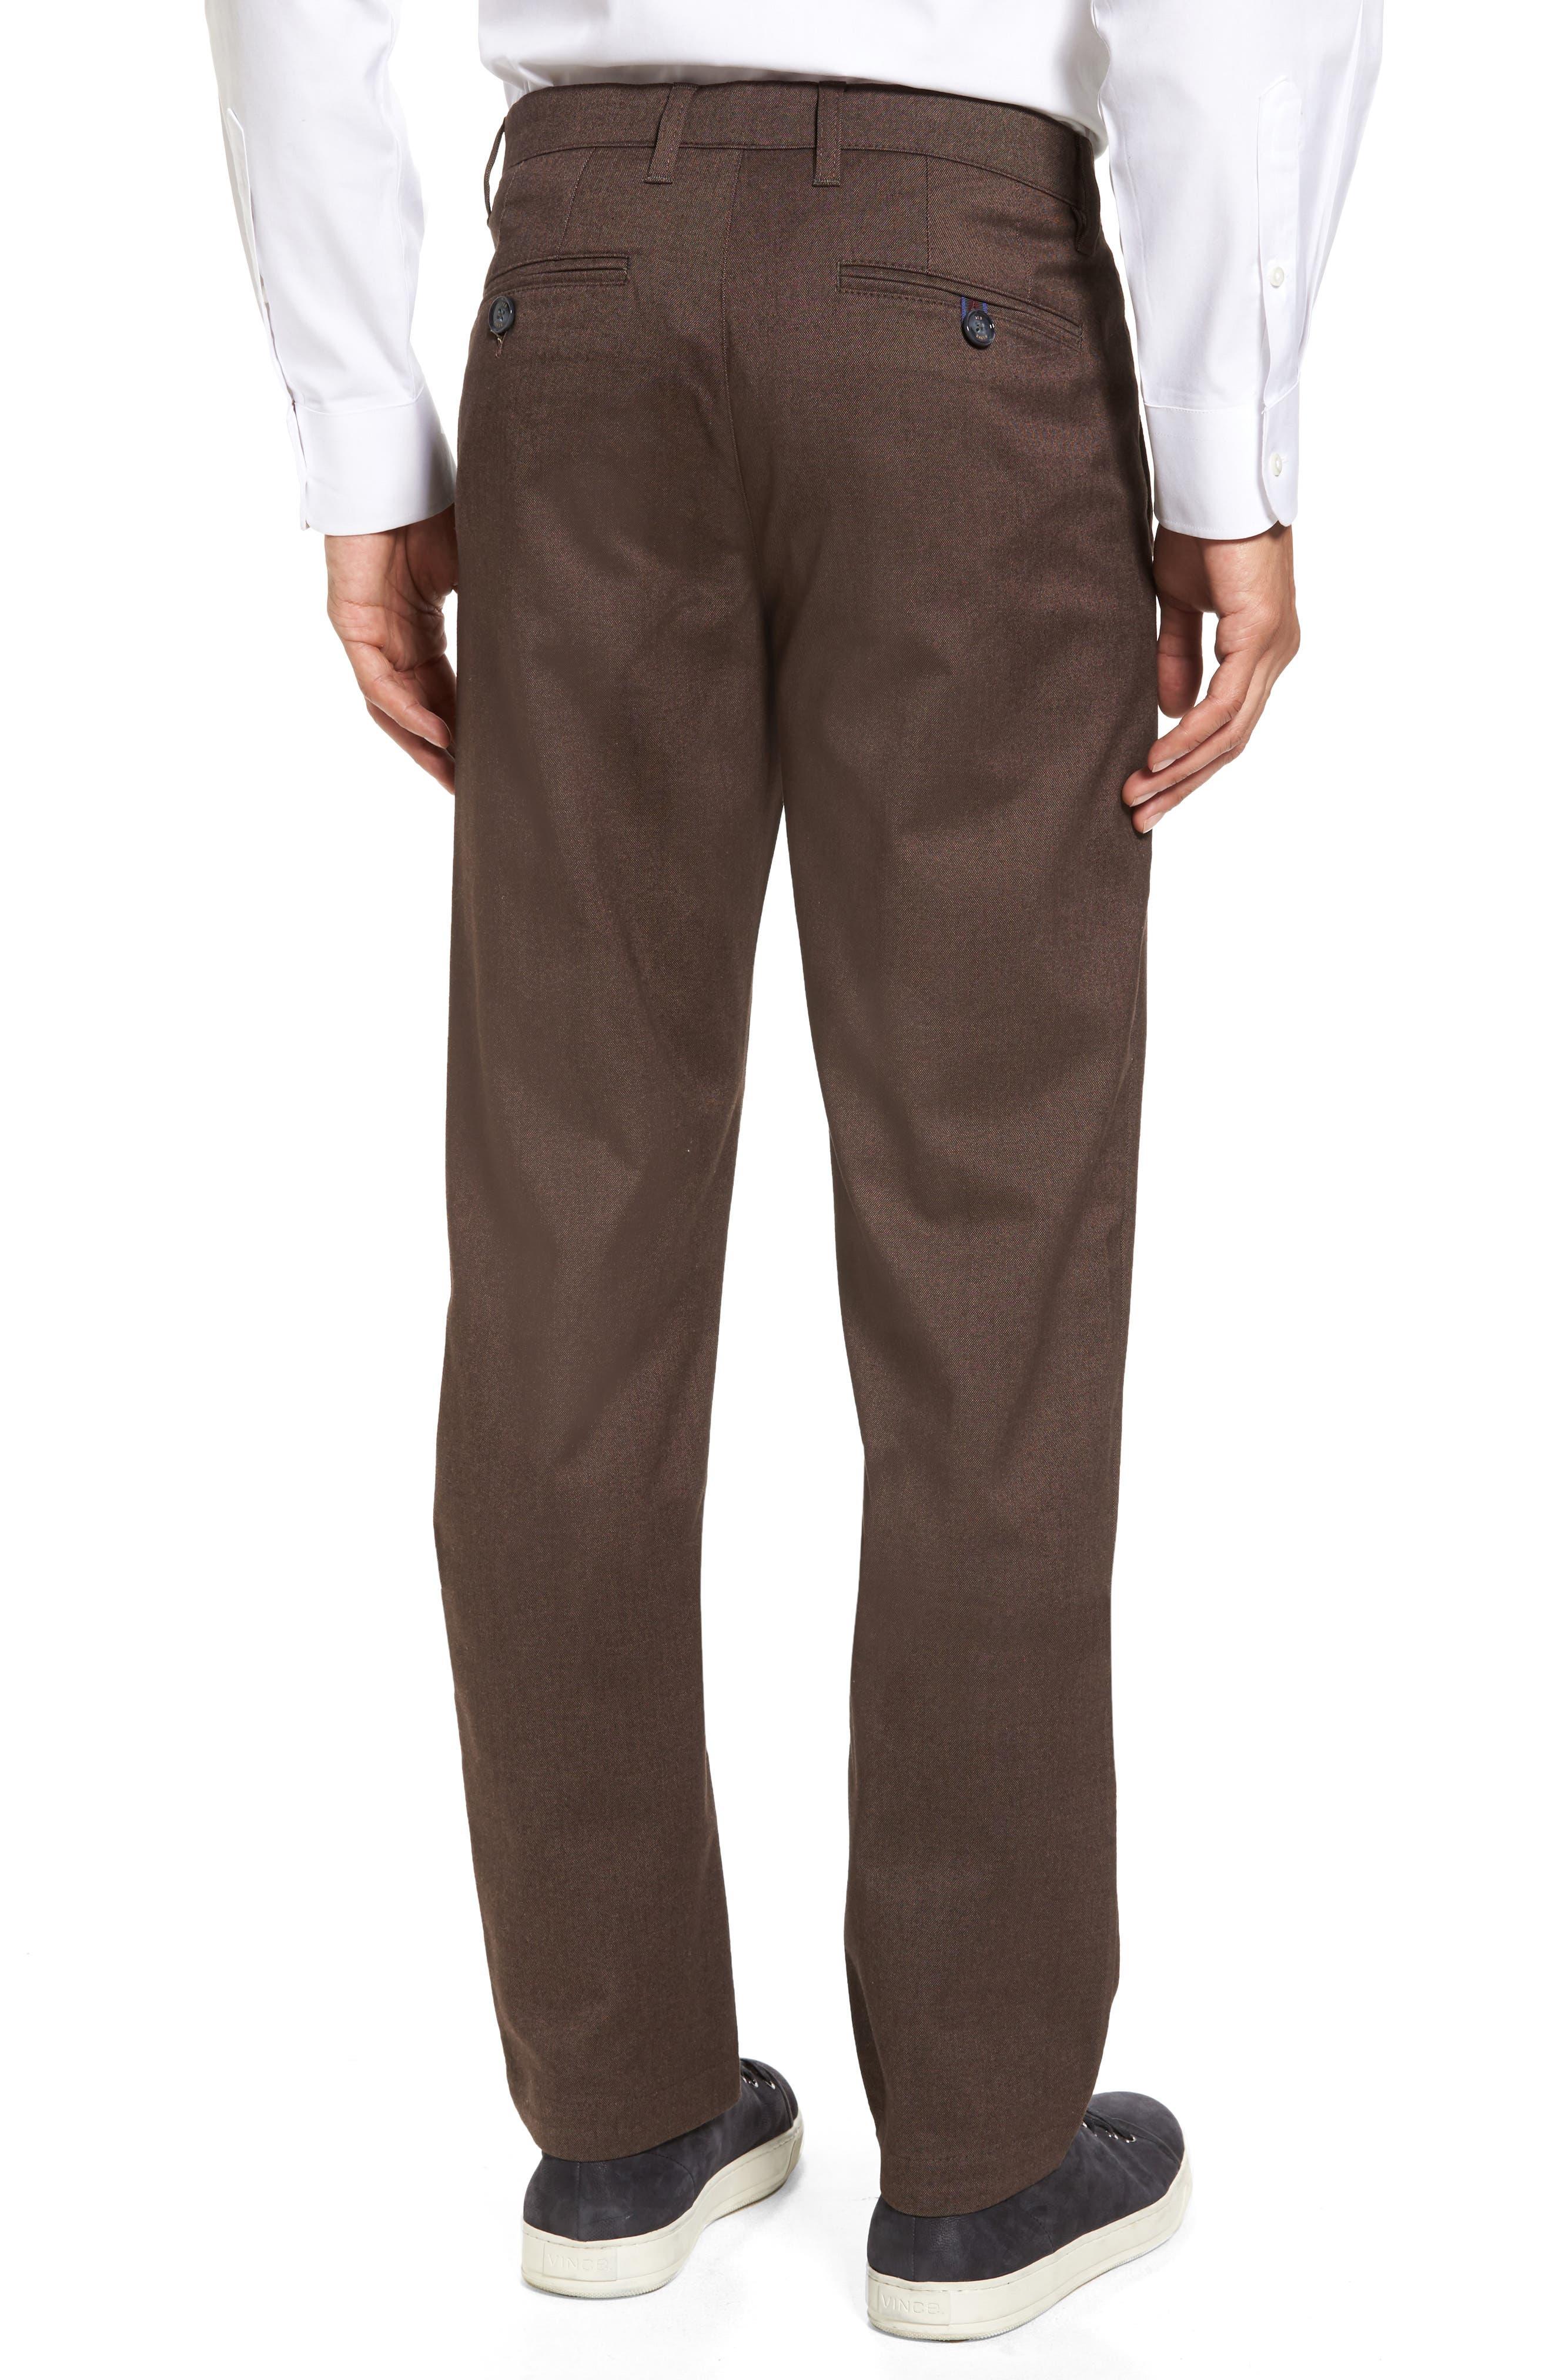 Freshman Modern Fit Brushed Pants,                             Alternate thumbnail 2, color,                             214